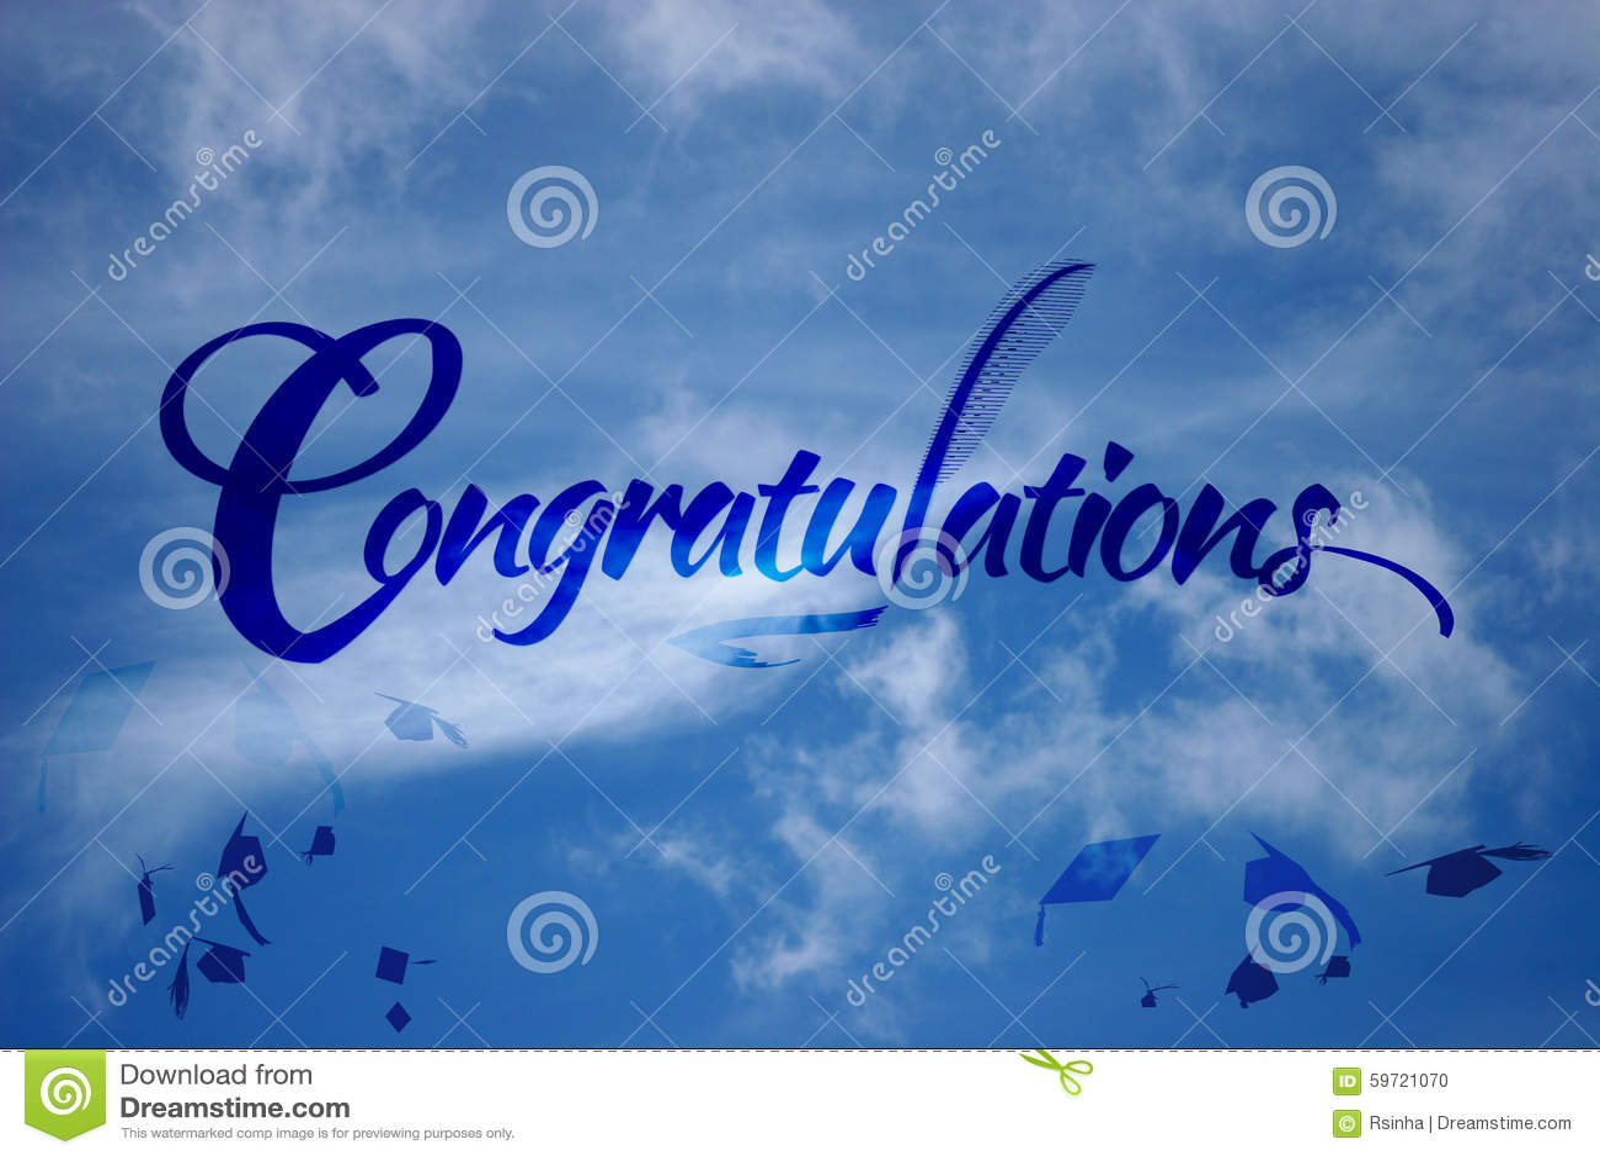 congratulations graduation stock illustration